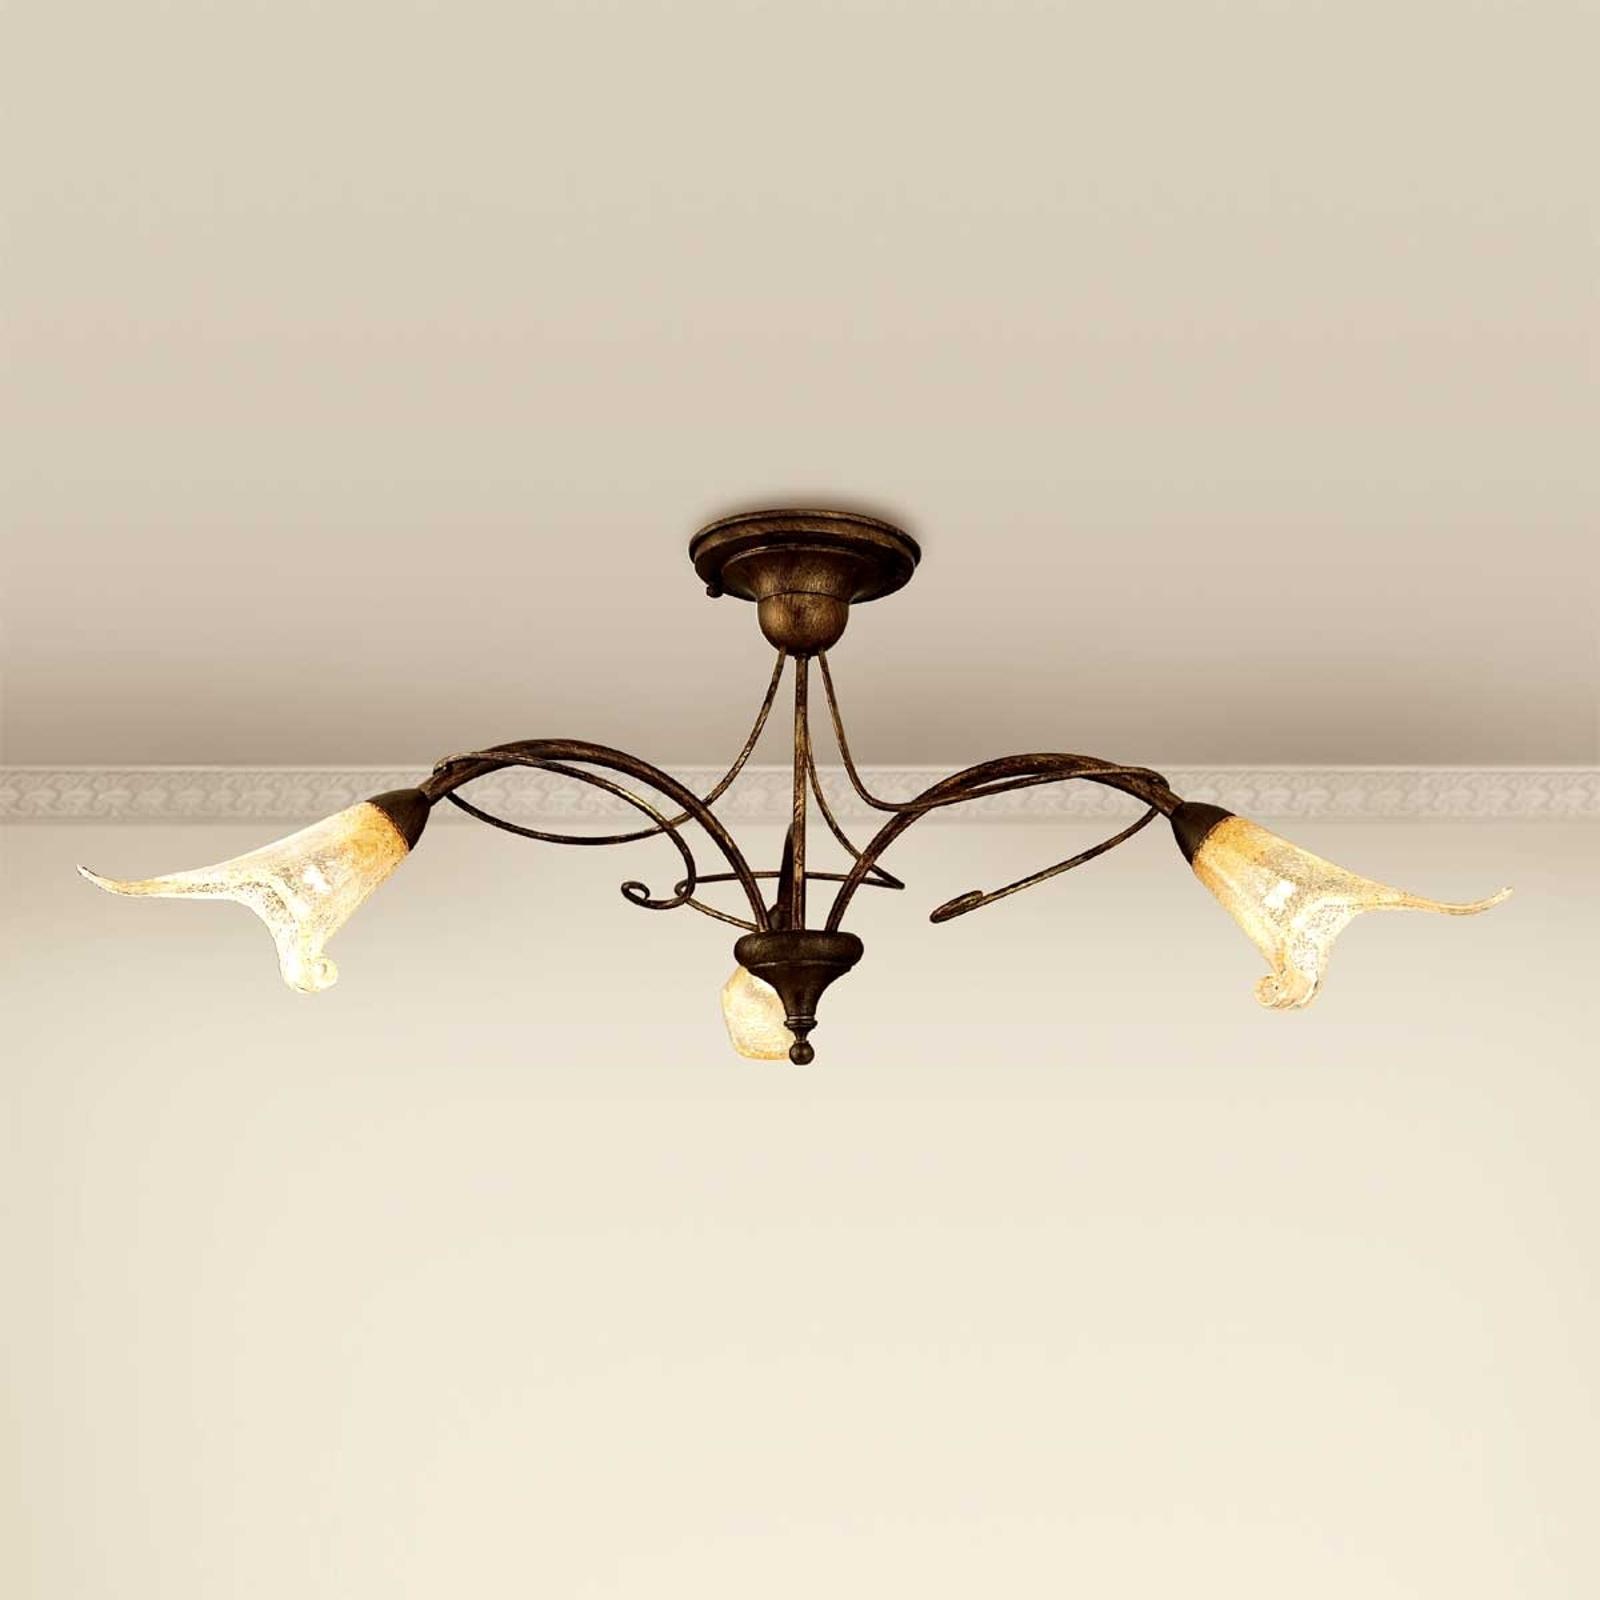 Lampa sufitowa RICCARDO kwiatowe motywy 3-punktowa